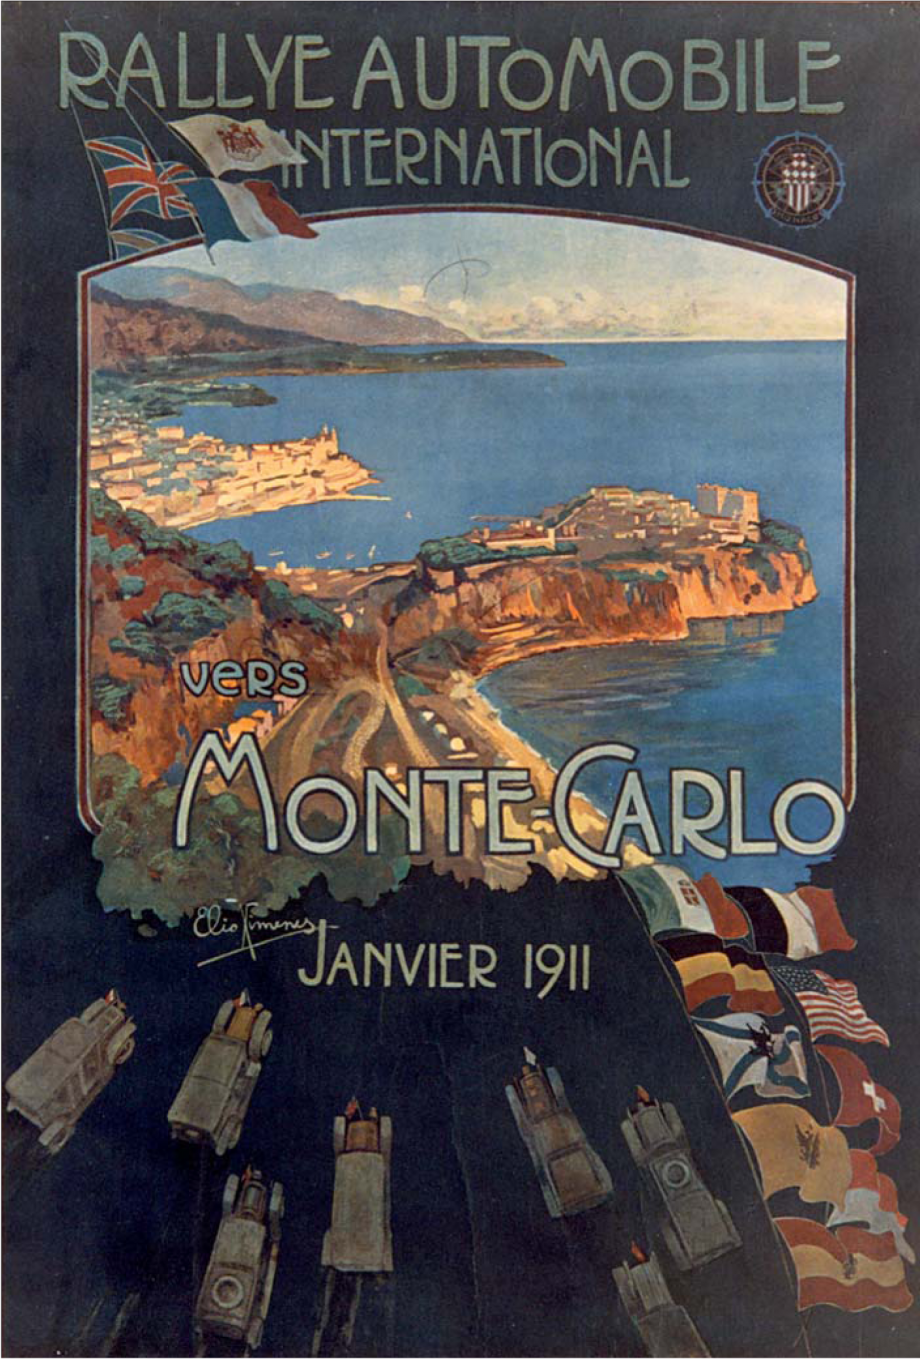 Rallye_Automobile_Monte-Carlo_.png